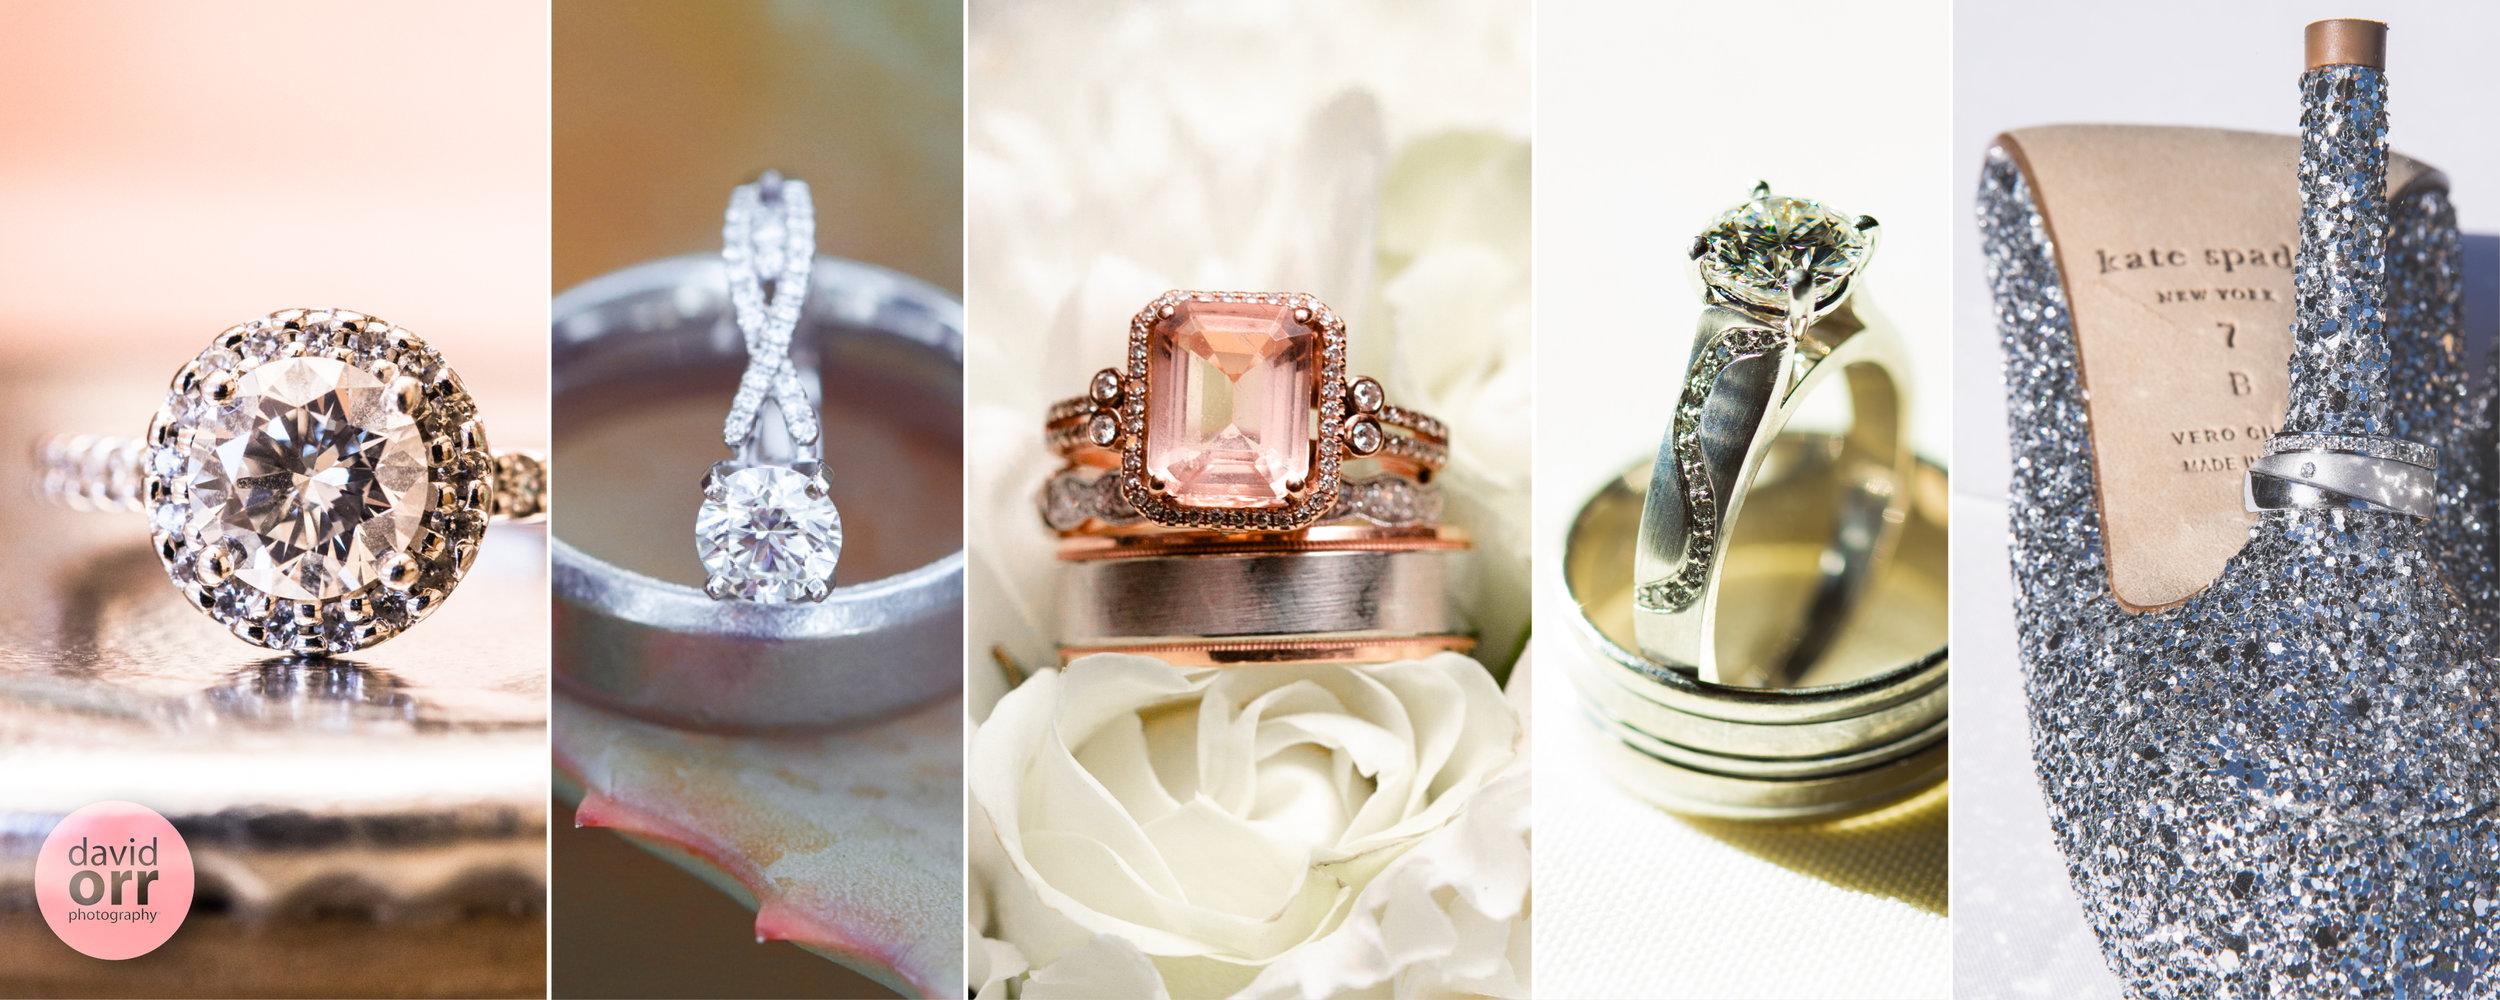 DavidOrrPhotography_Wedding-Ring-Trends.jpg